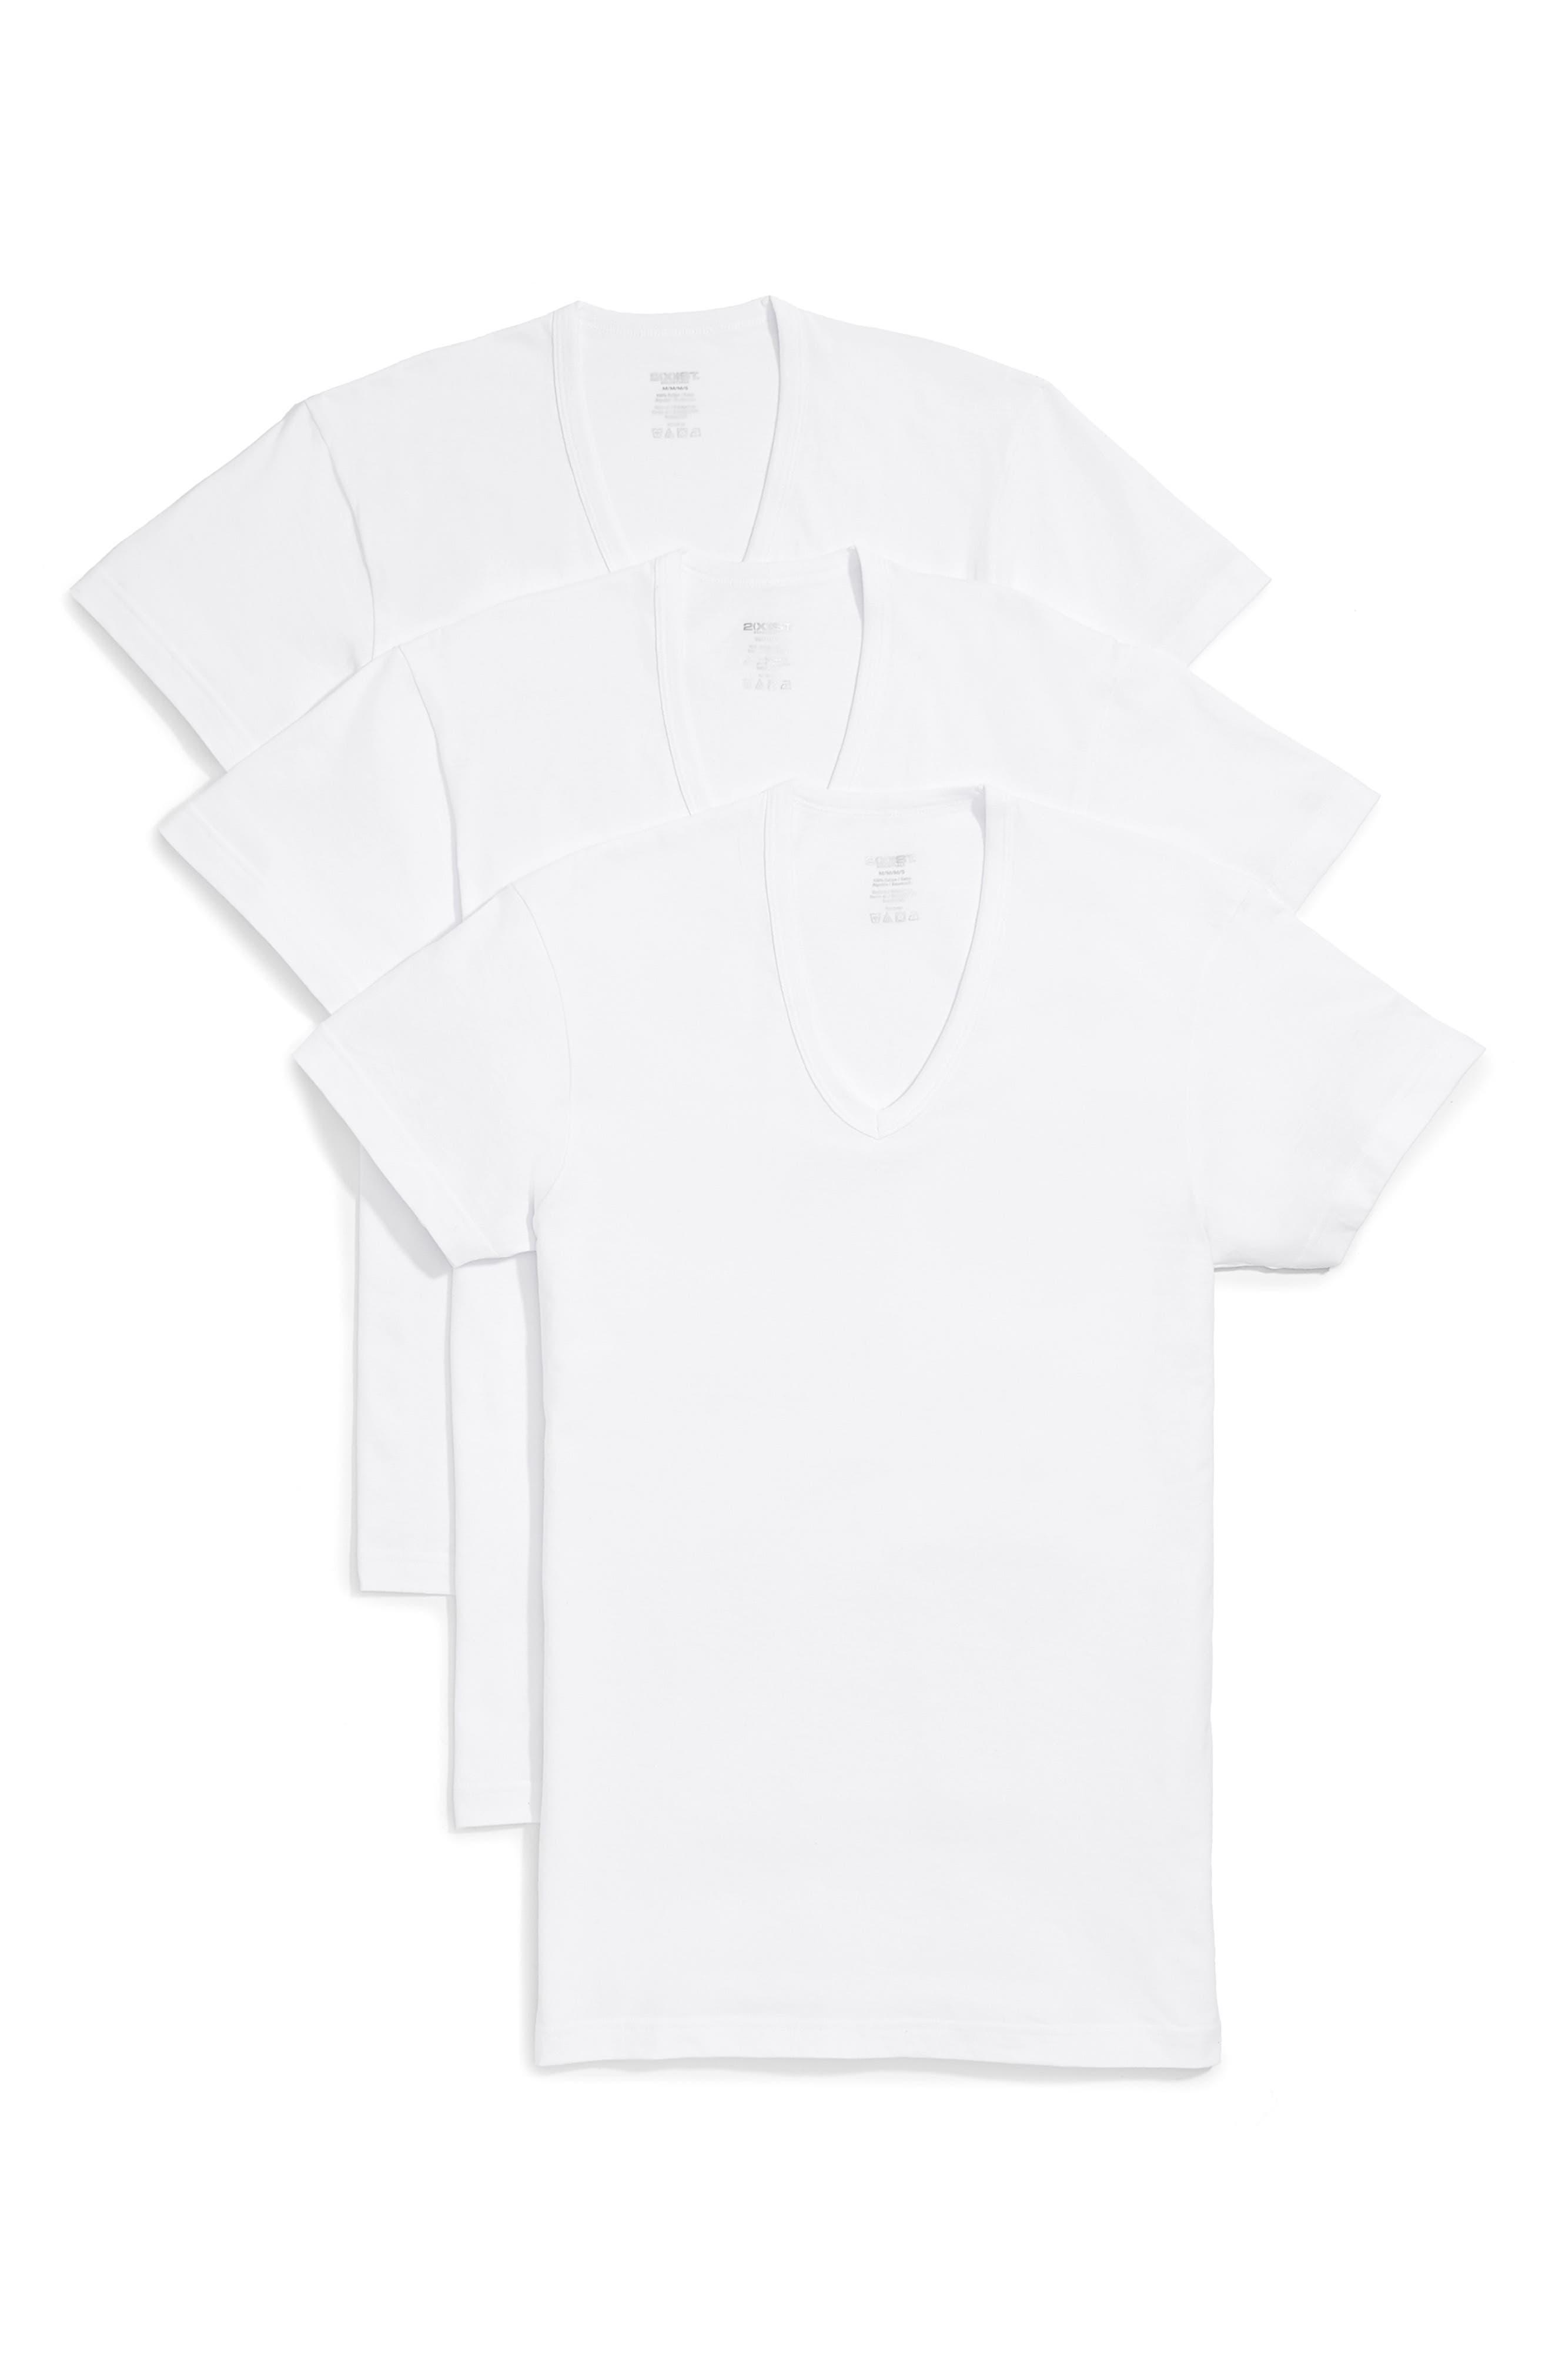 Slim Fit 3-Pack Cotton T-Shirt,                         Main,                         color, WHITE NEW LOGO